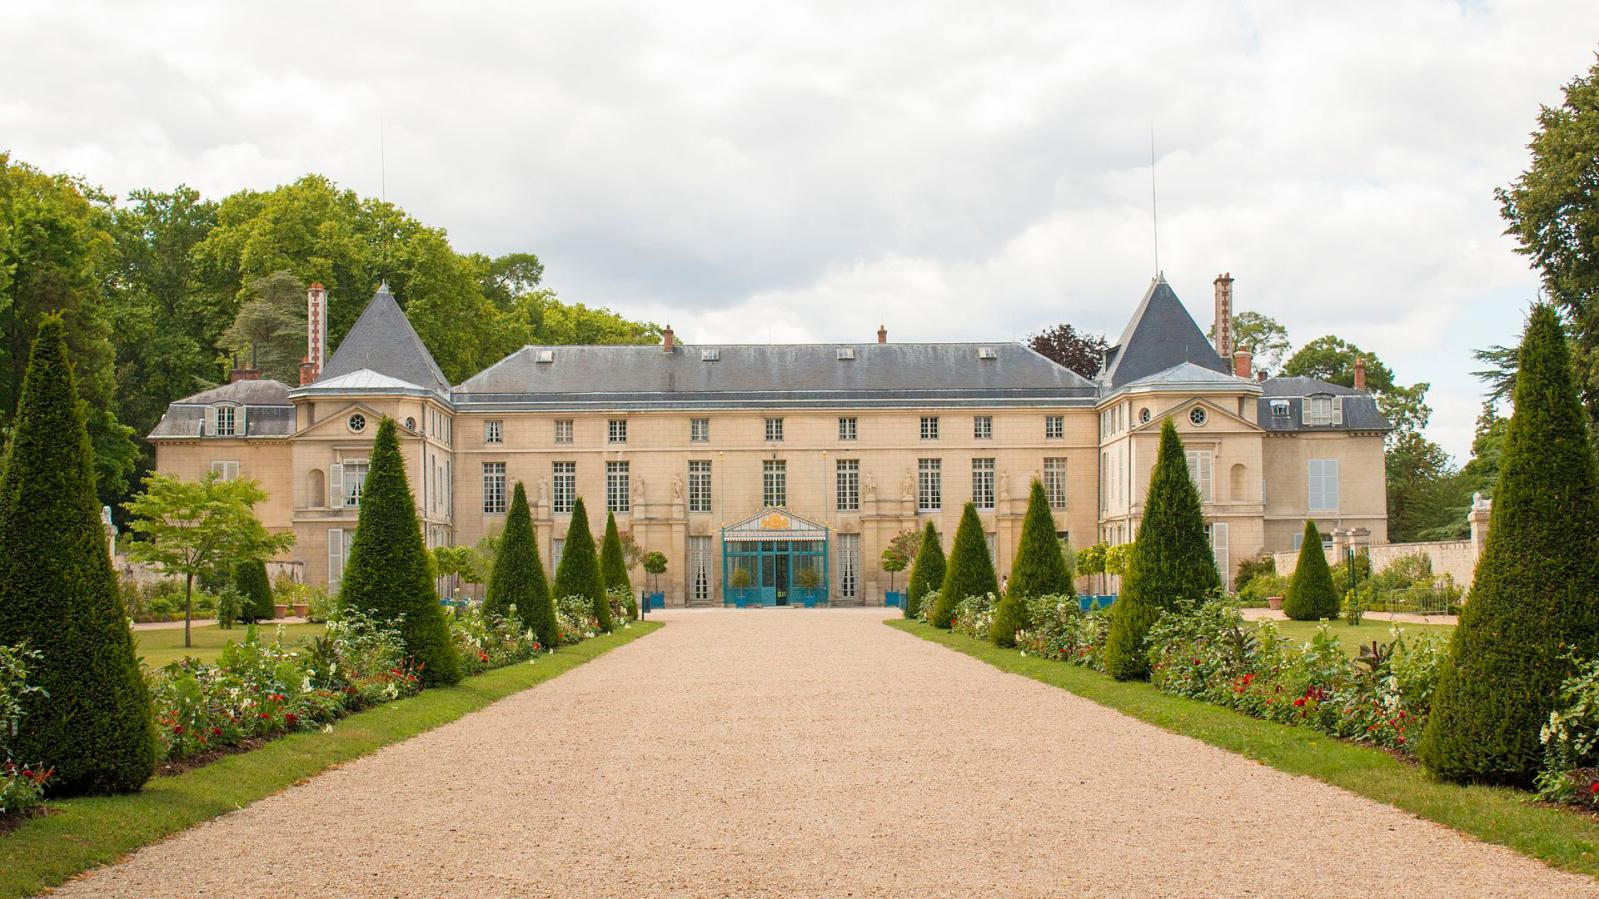 Château de Malmaison © Pedro Faber(CC BY-SA 4.0)